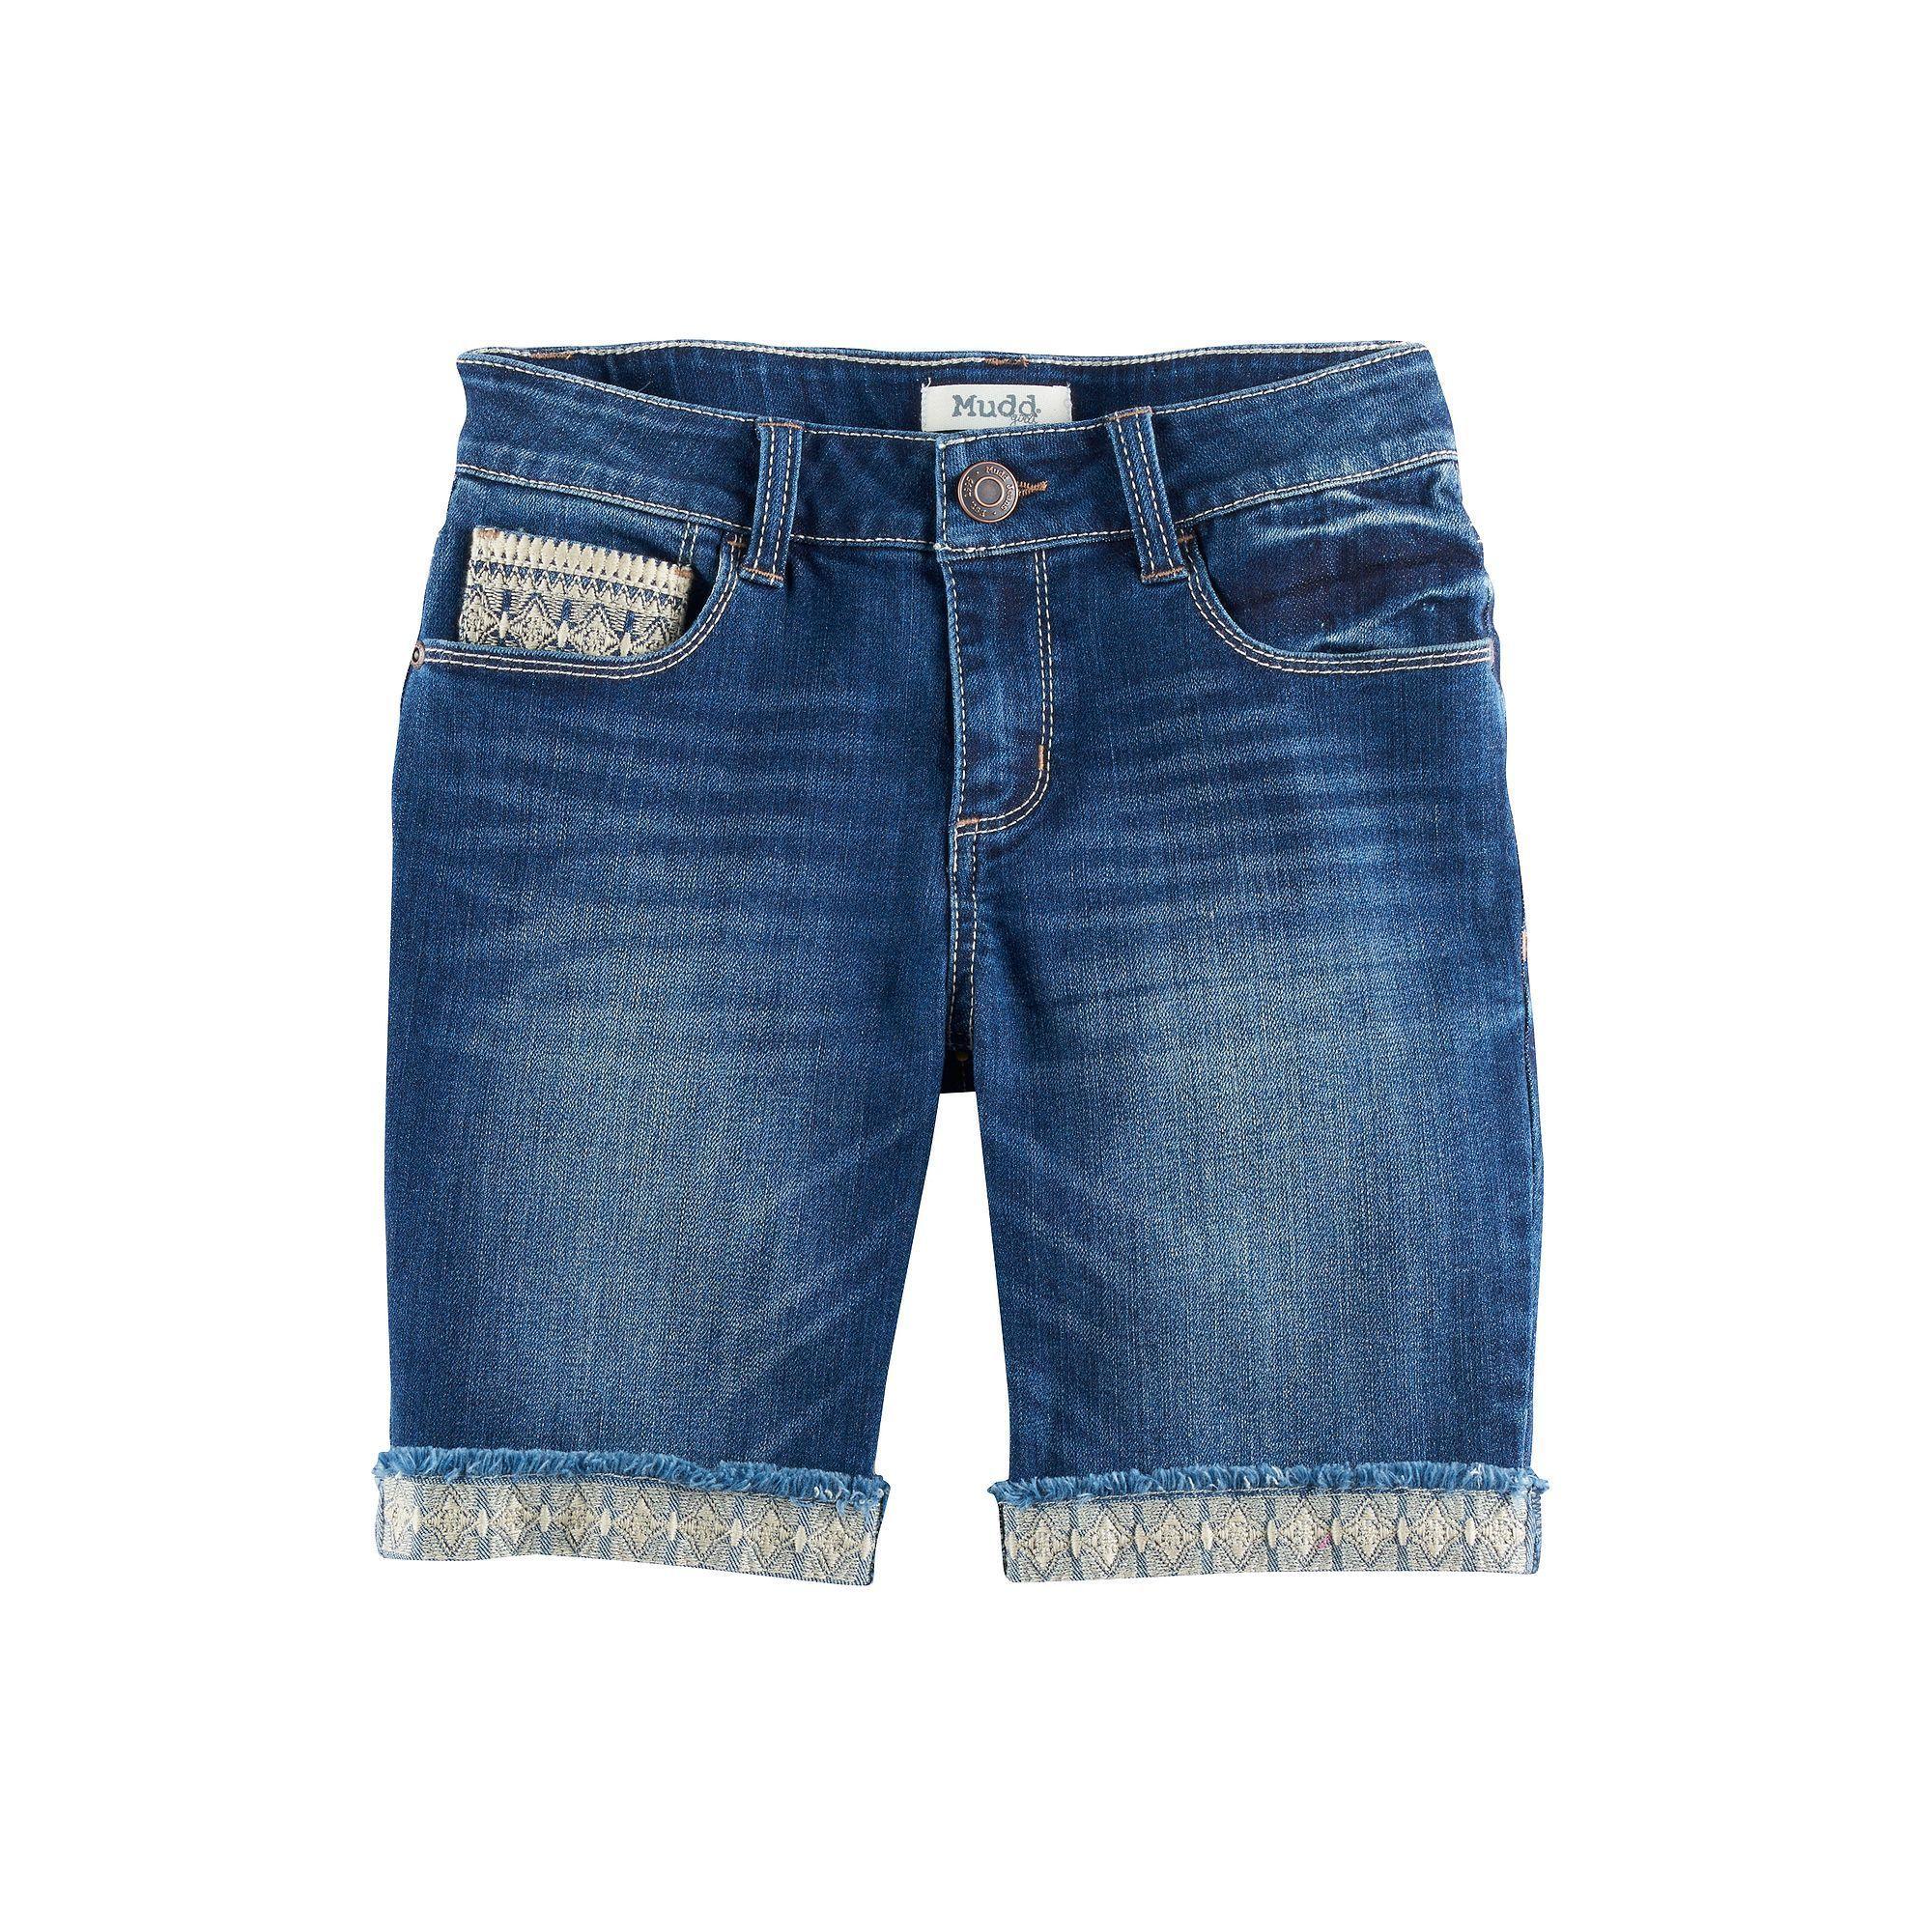 girls size 16 bermuda shorts